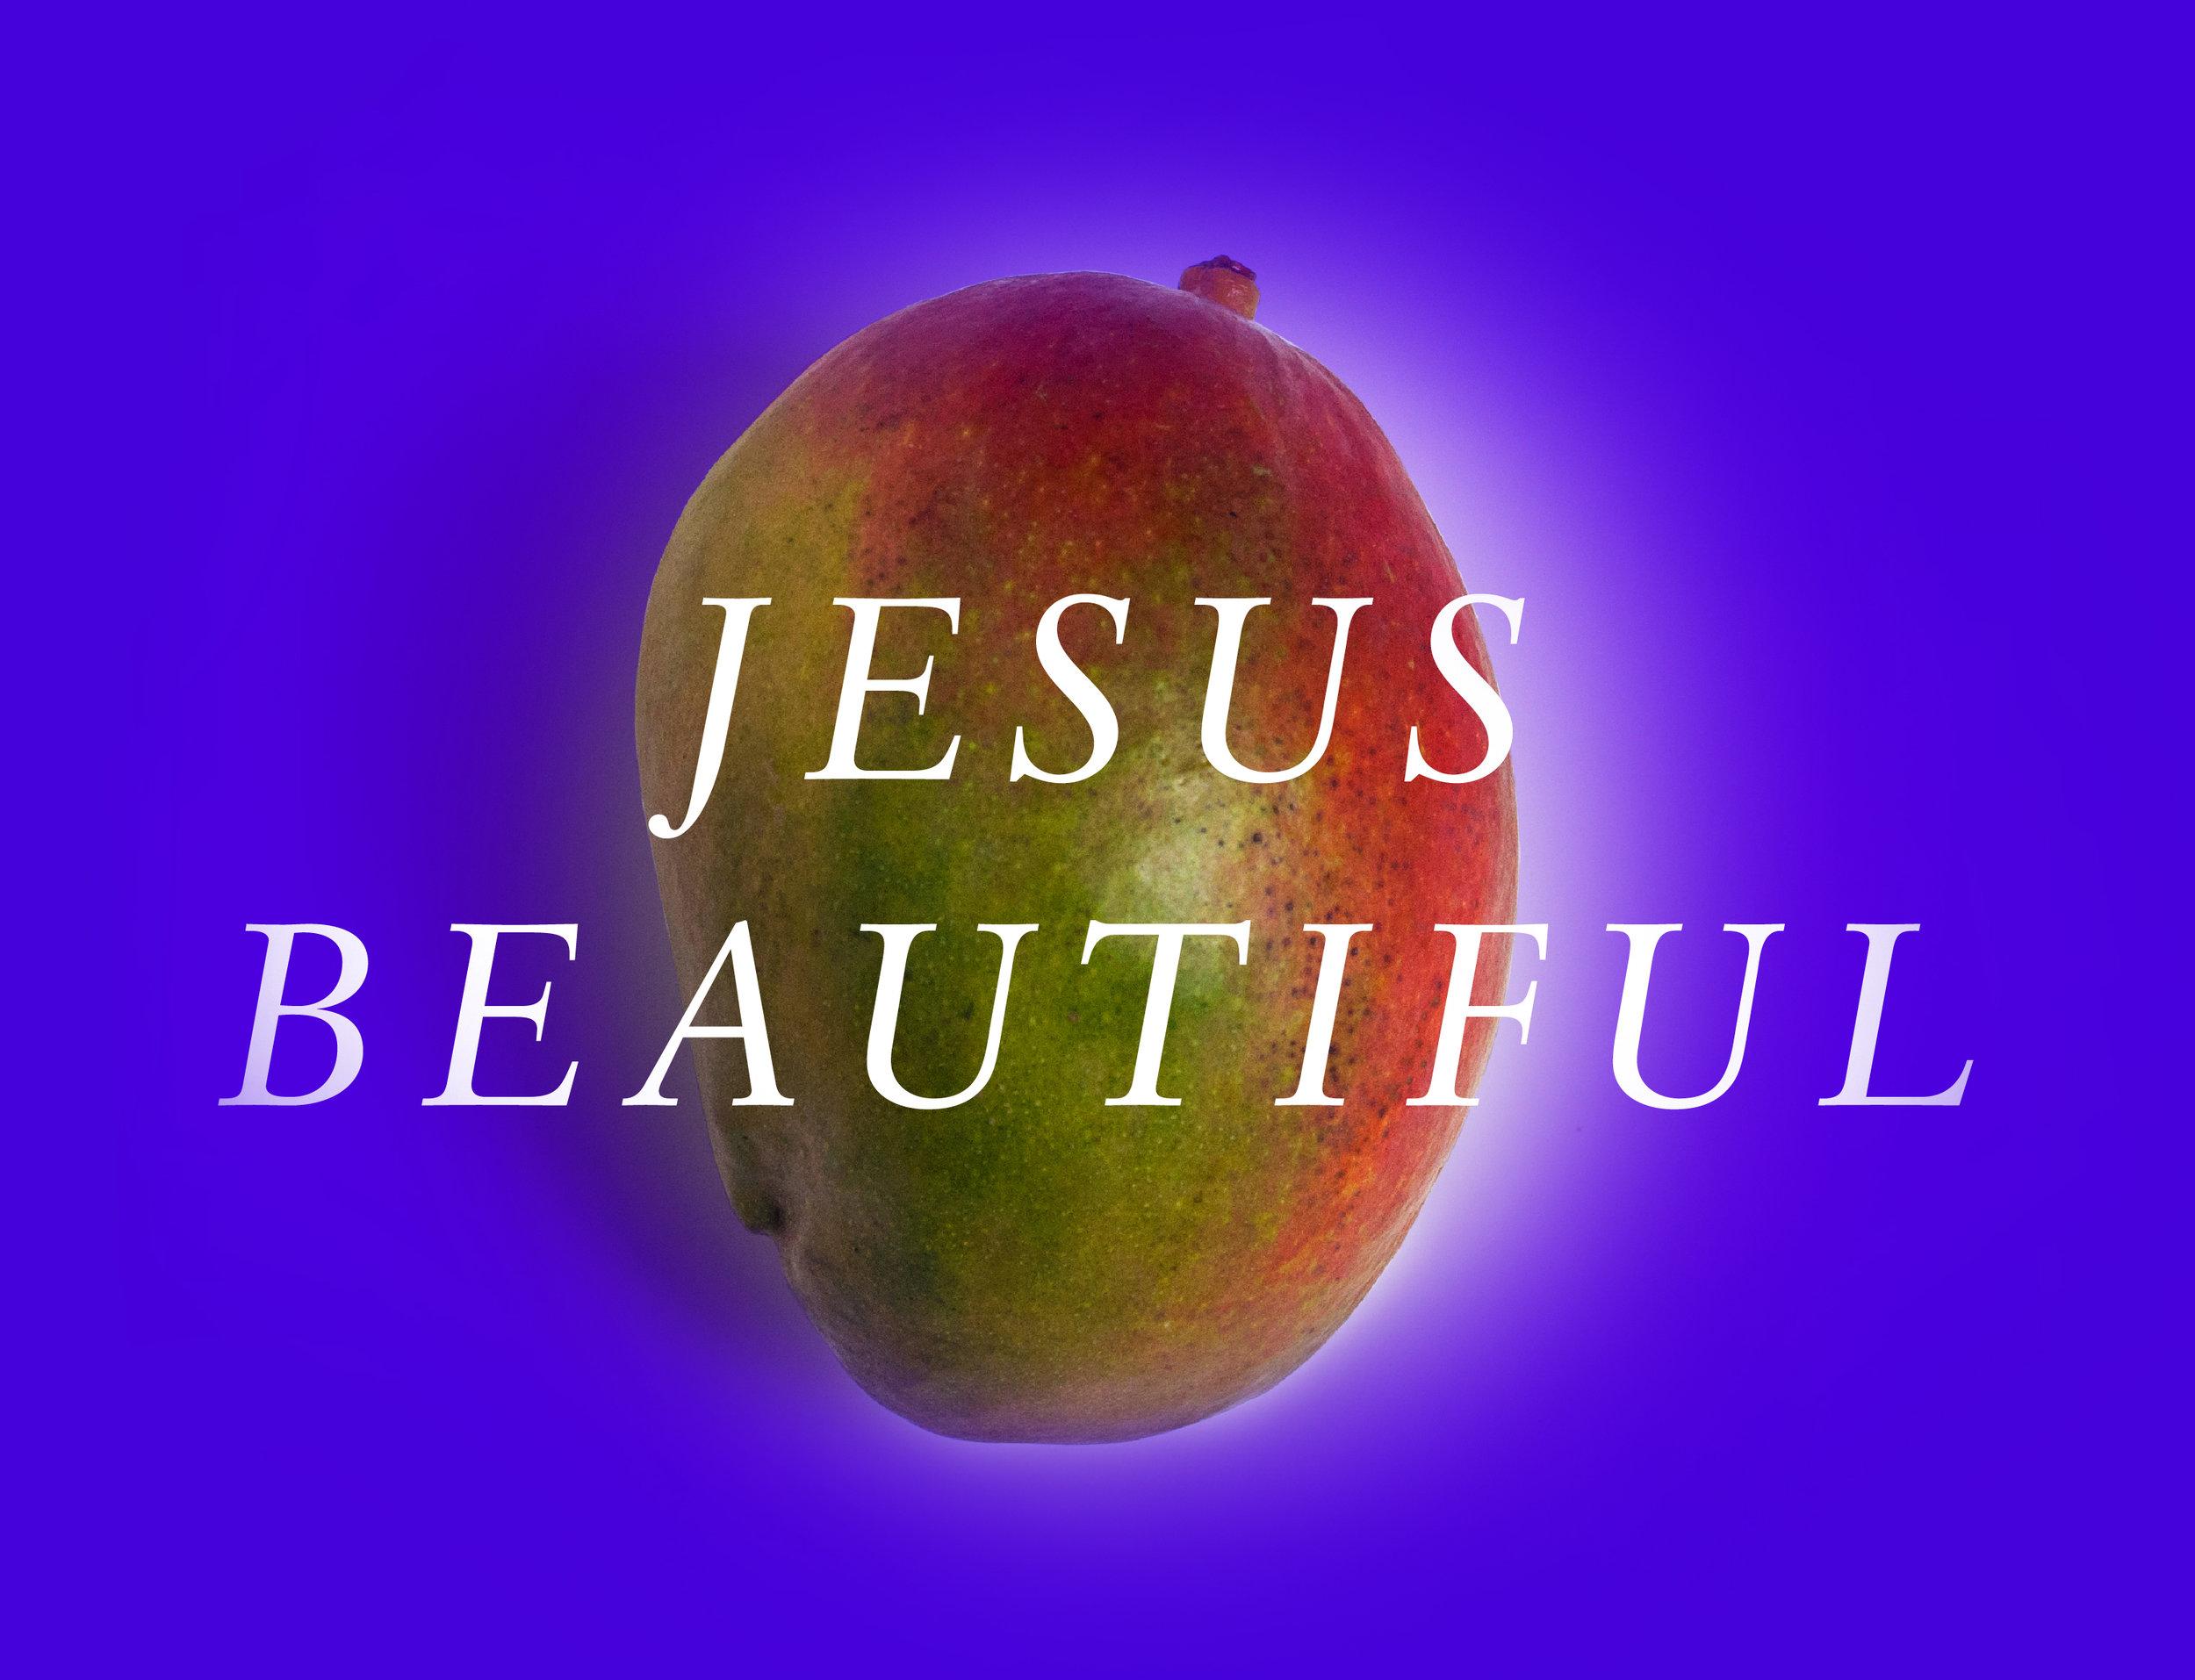 Jesus-Beautiful-BG-1_Final.jpg